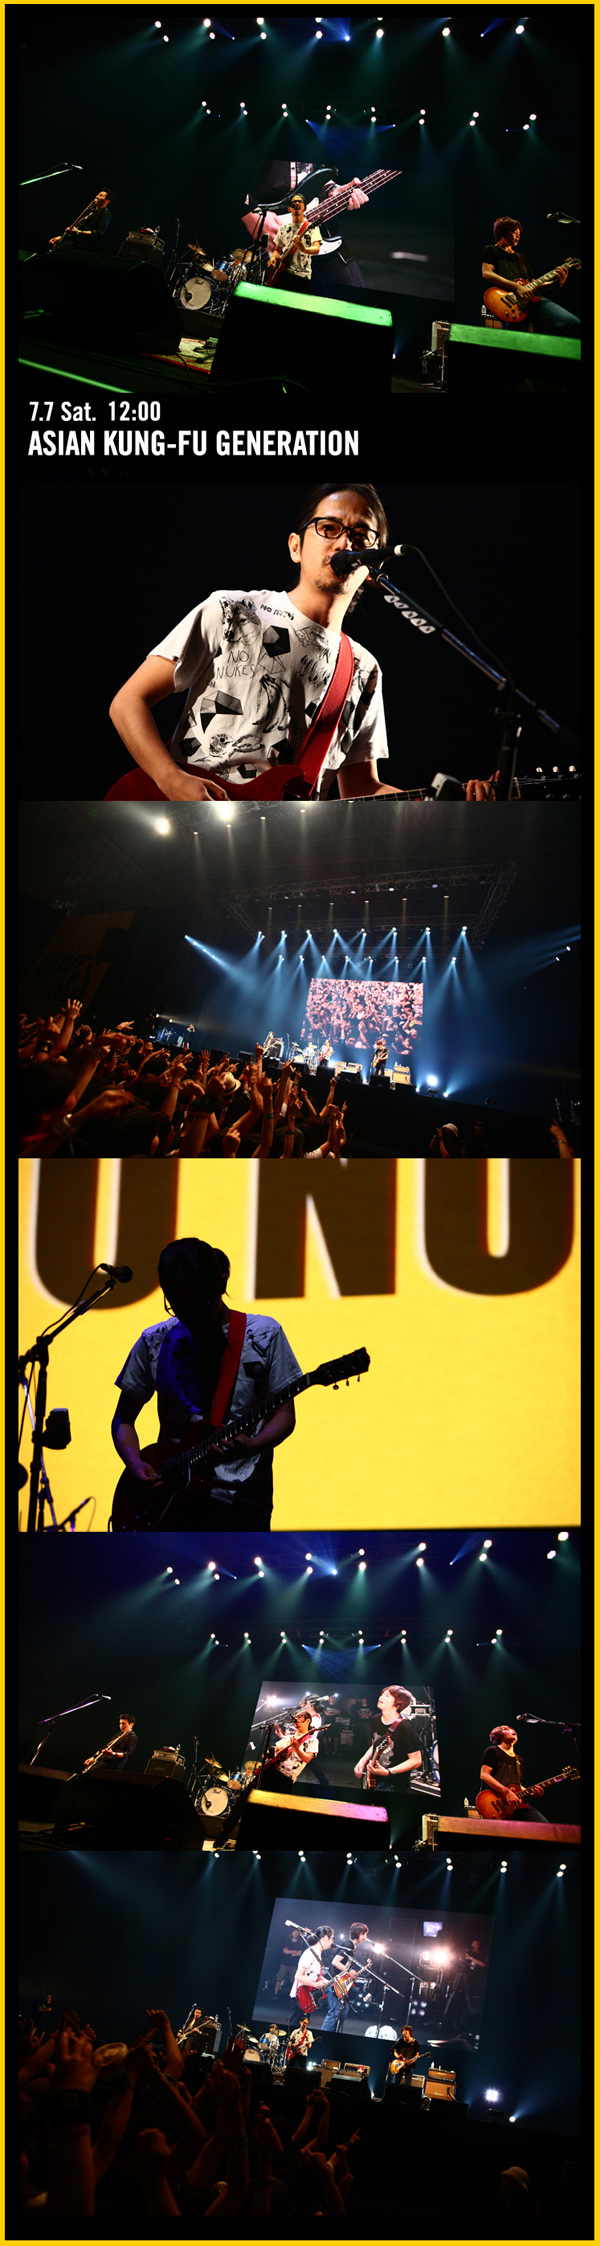 NONUKES2012_AKG